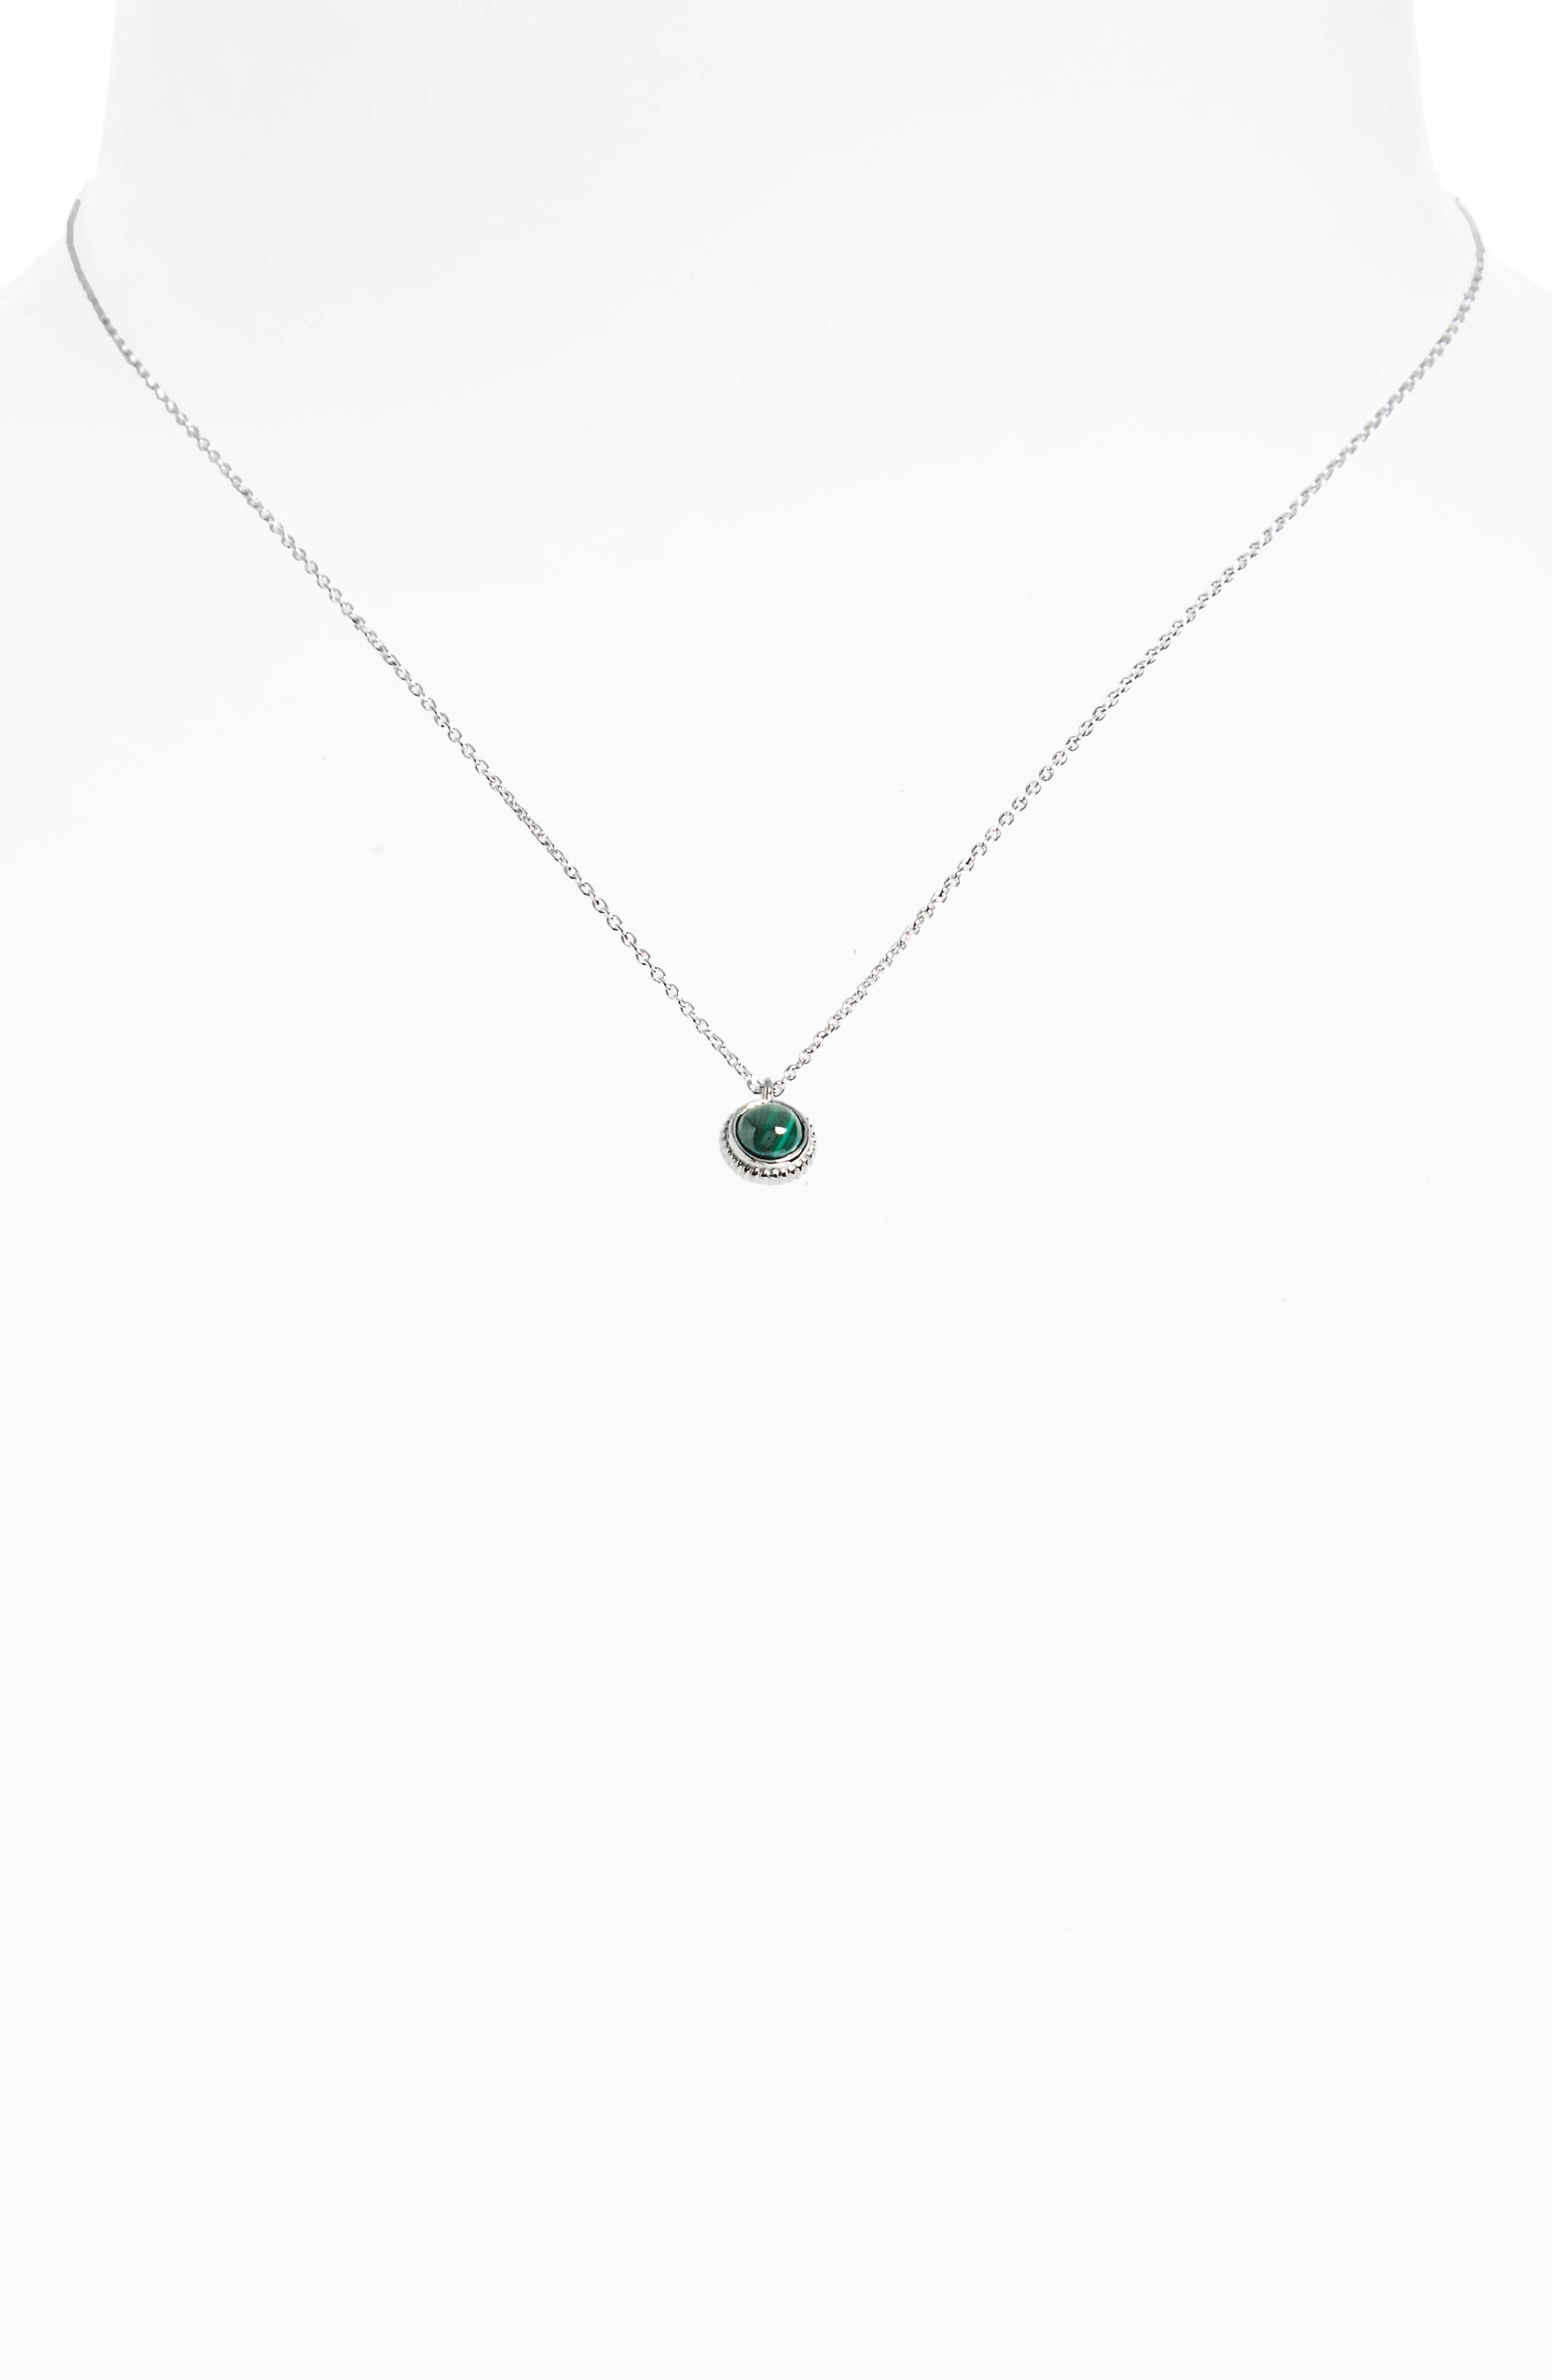 Semiprecious Stone Pendant Necklace,                             Alternate thumbnail 2, color,                             STERLING SILVER/ MALACHITE